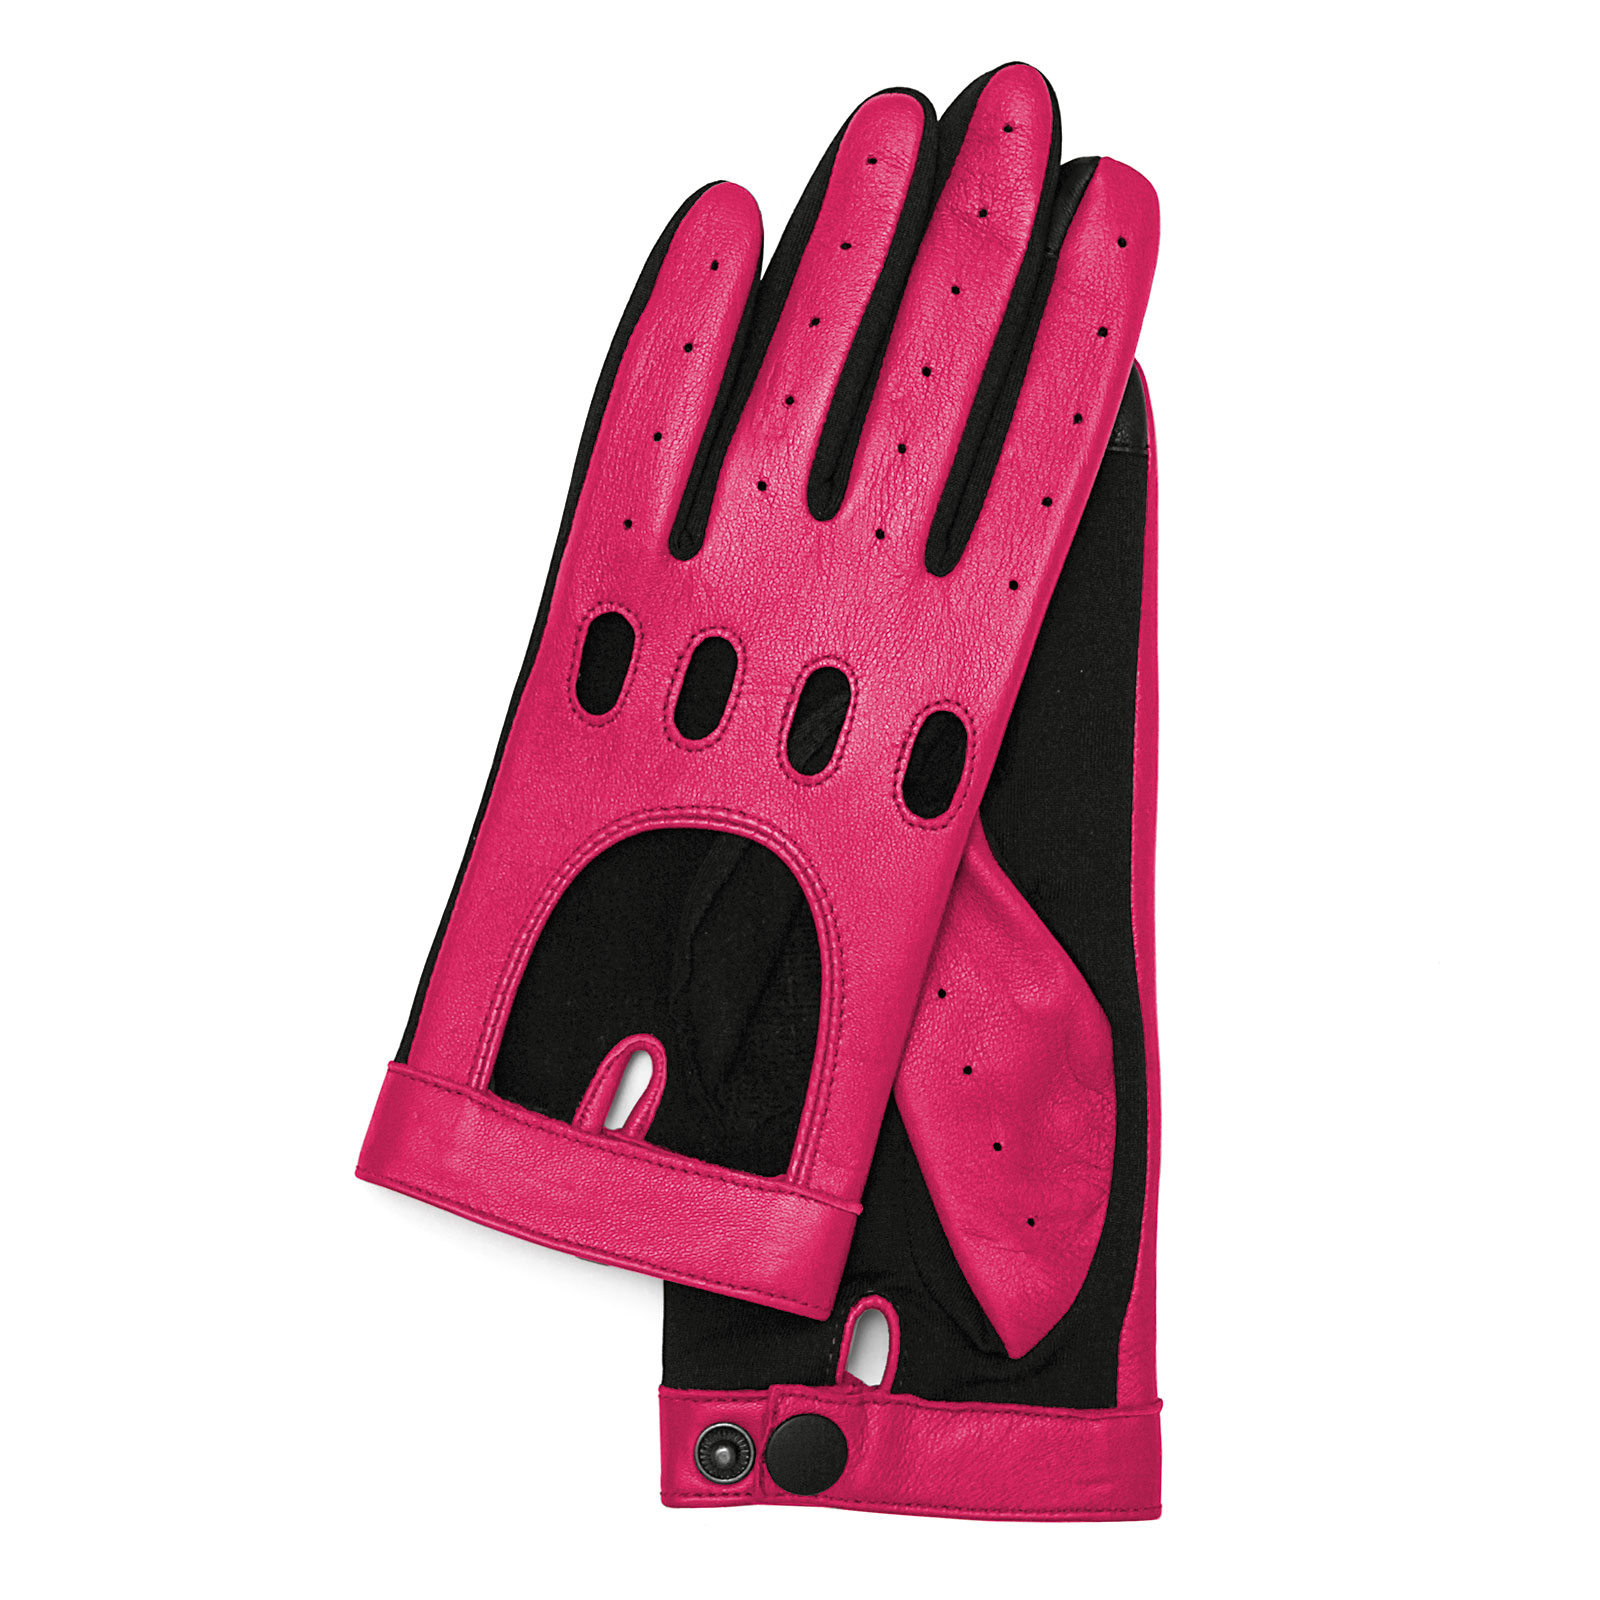 Mia Driver's Glove hot pink 268